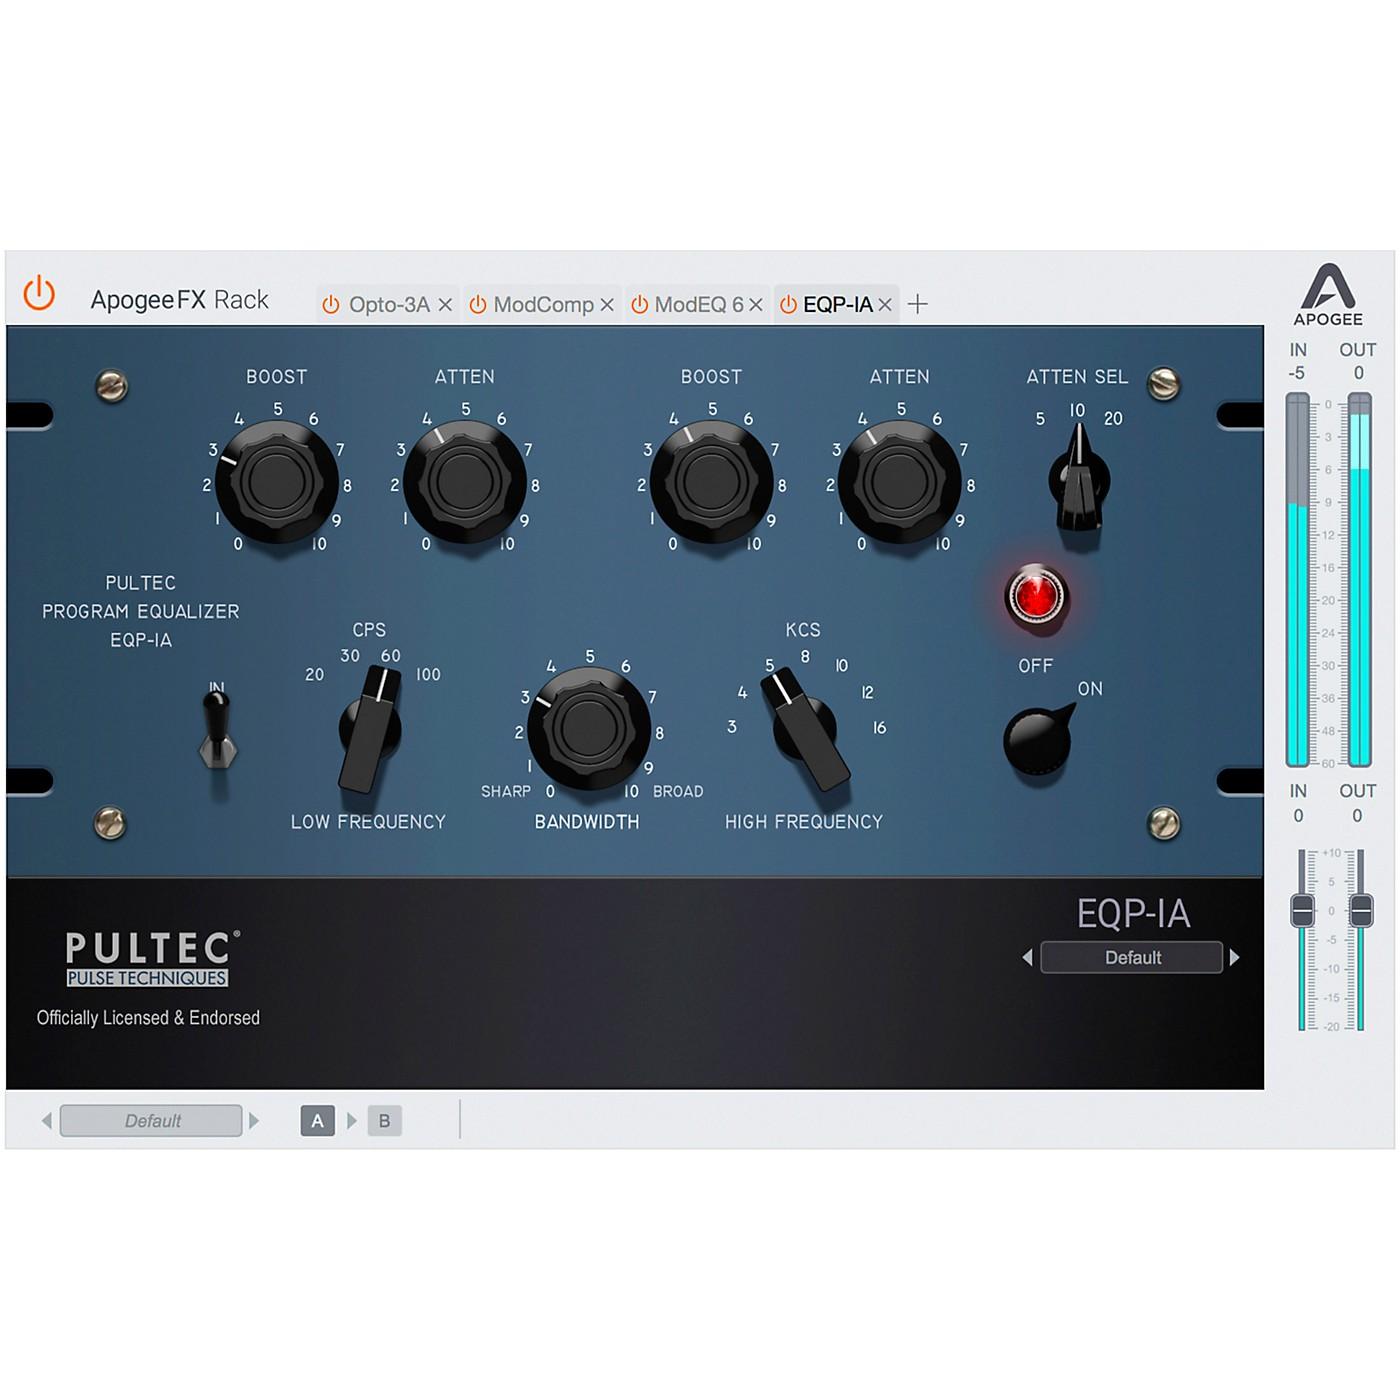 Apogee FX Rack Pultec EQP-1A Program Equalizer thumbnail